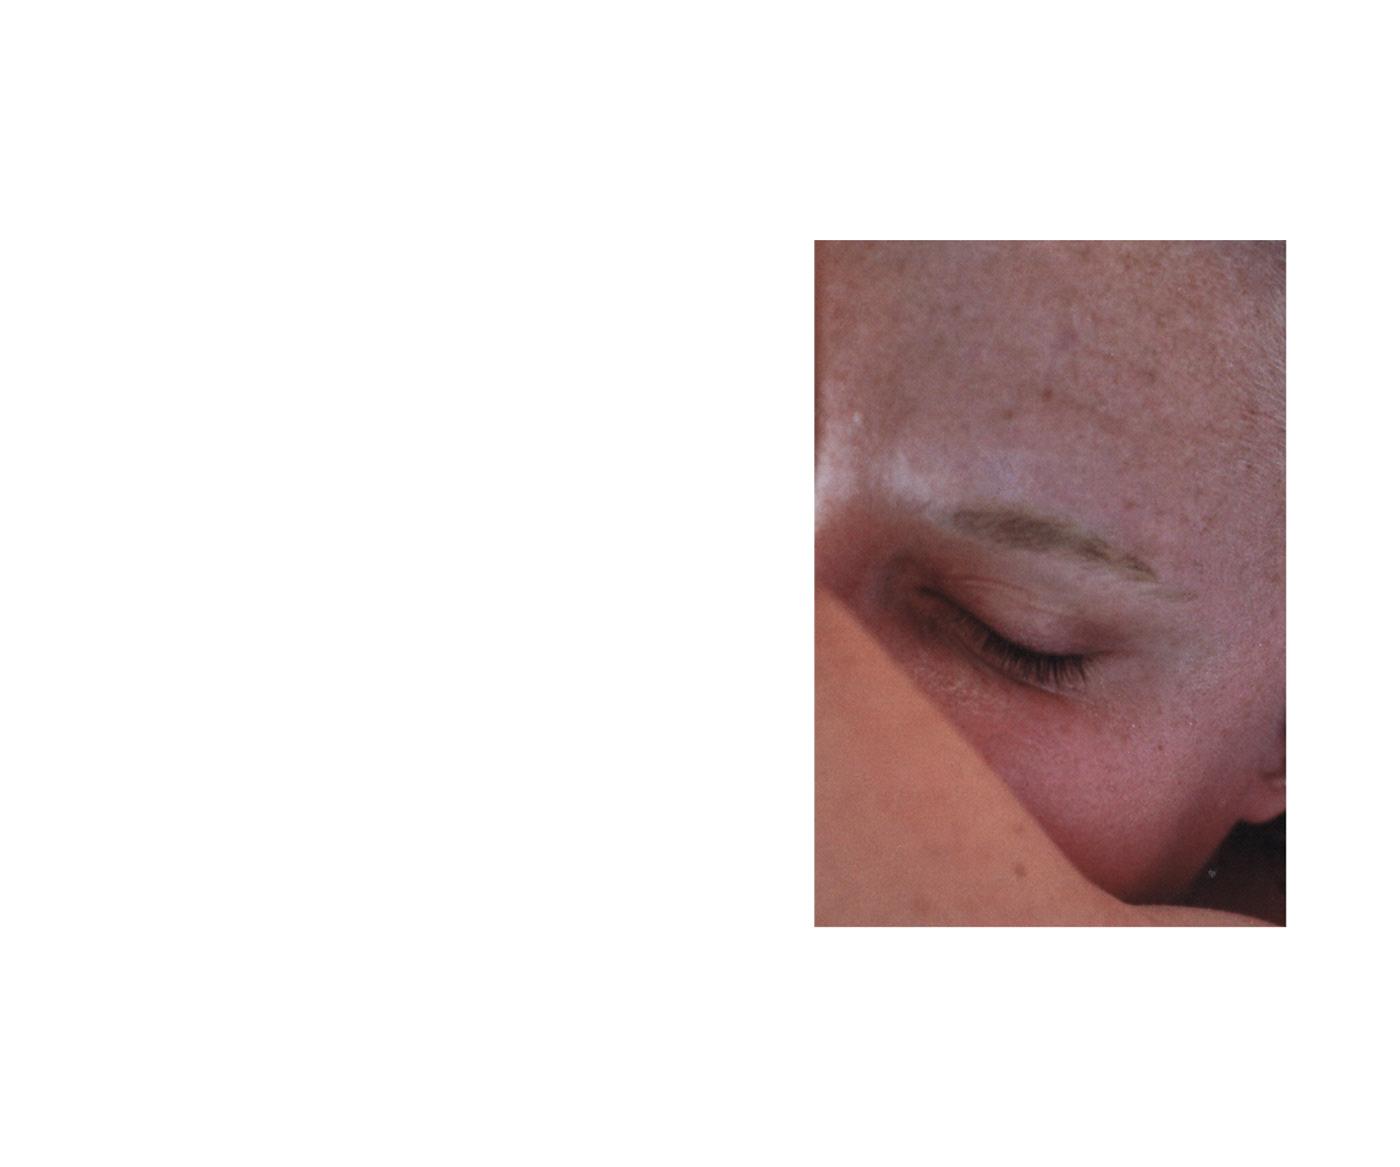 Image may contain: human face